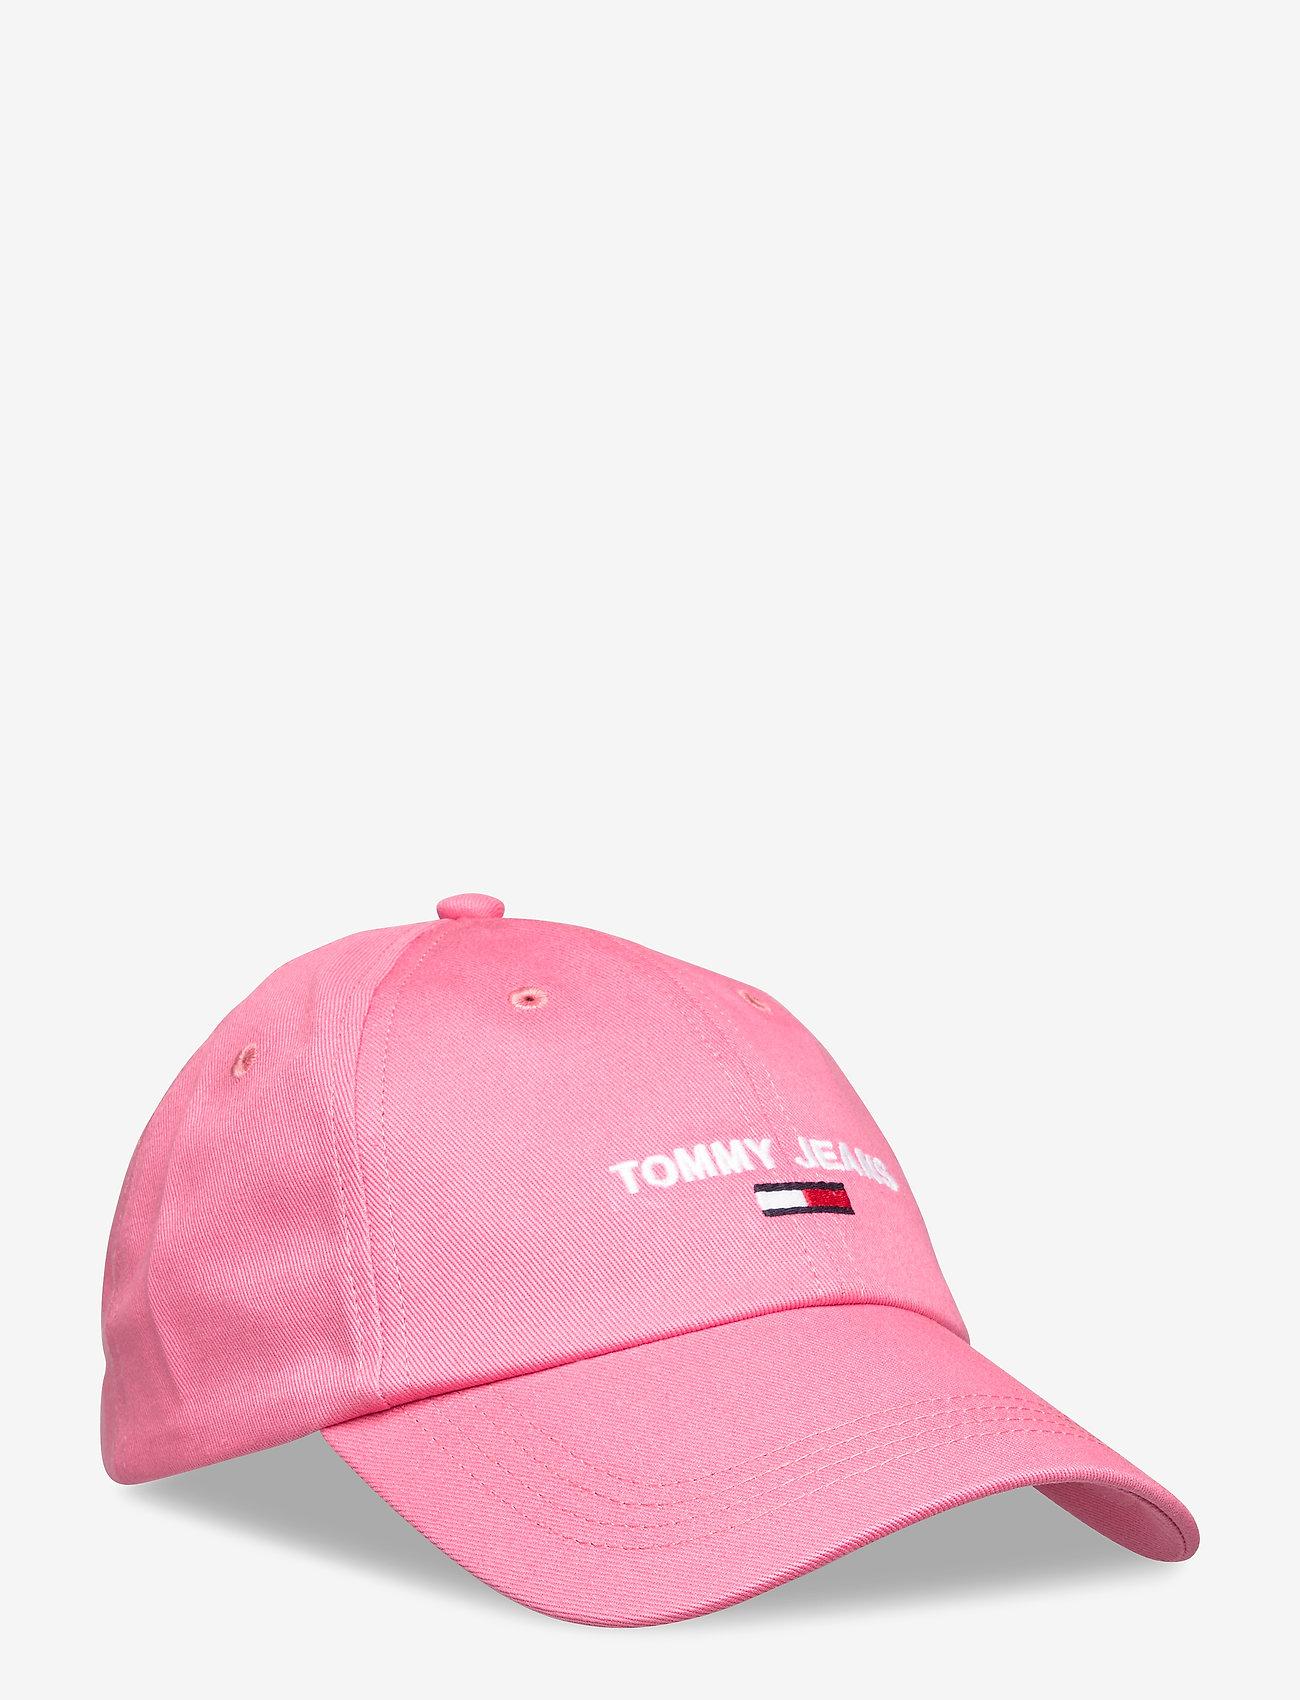 Tommy Hilfiger - TJW SPORT CAP - caps - glamour pink - 0